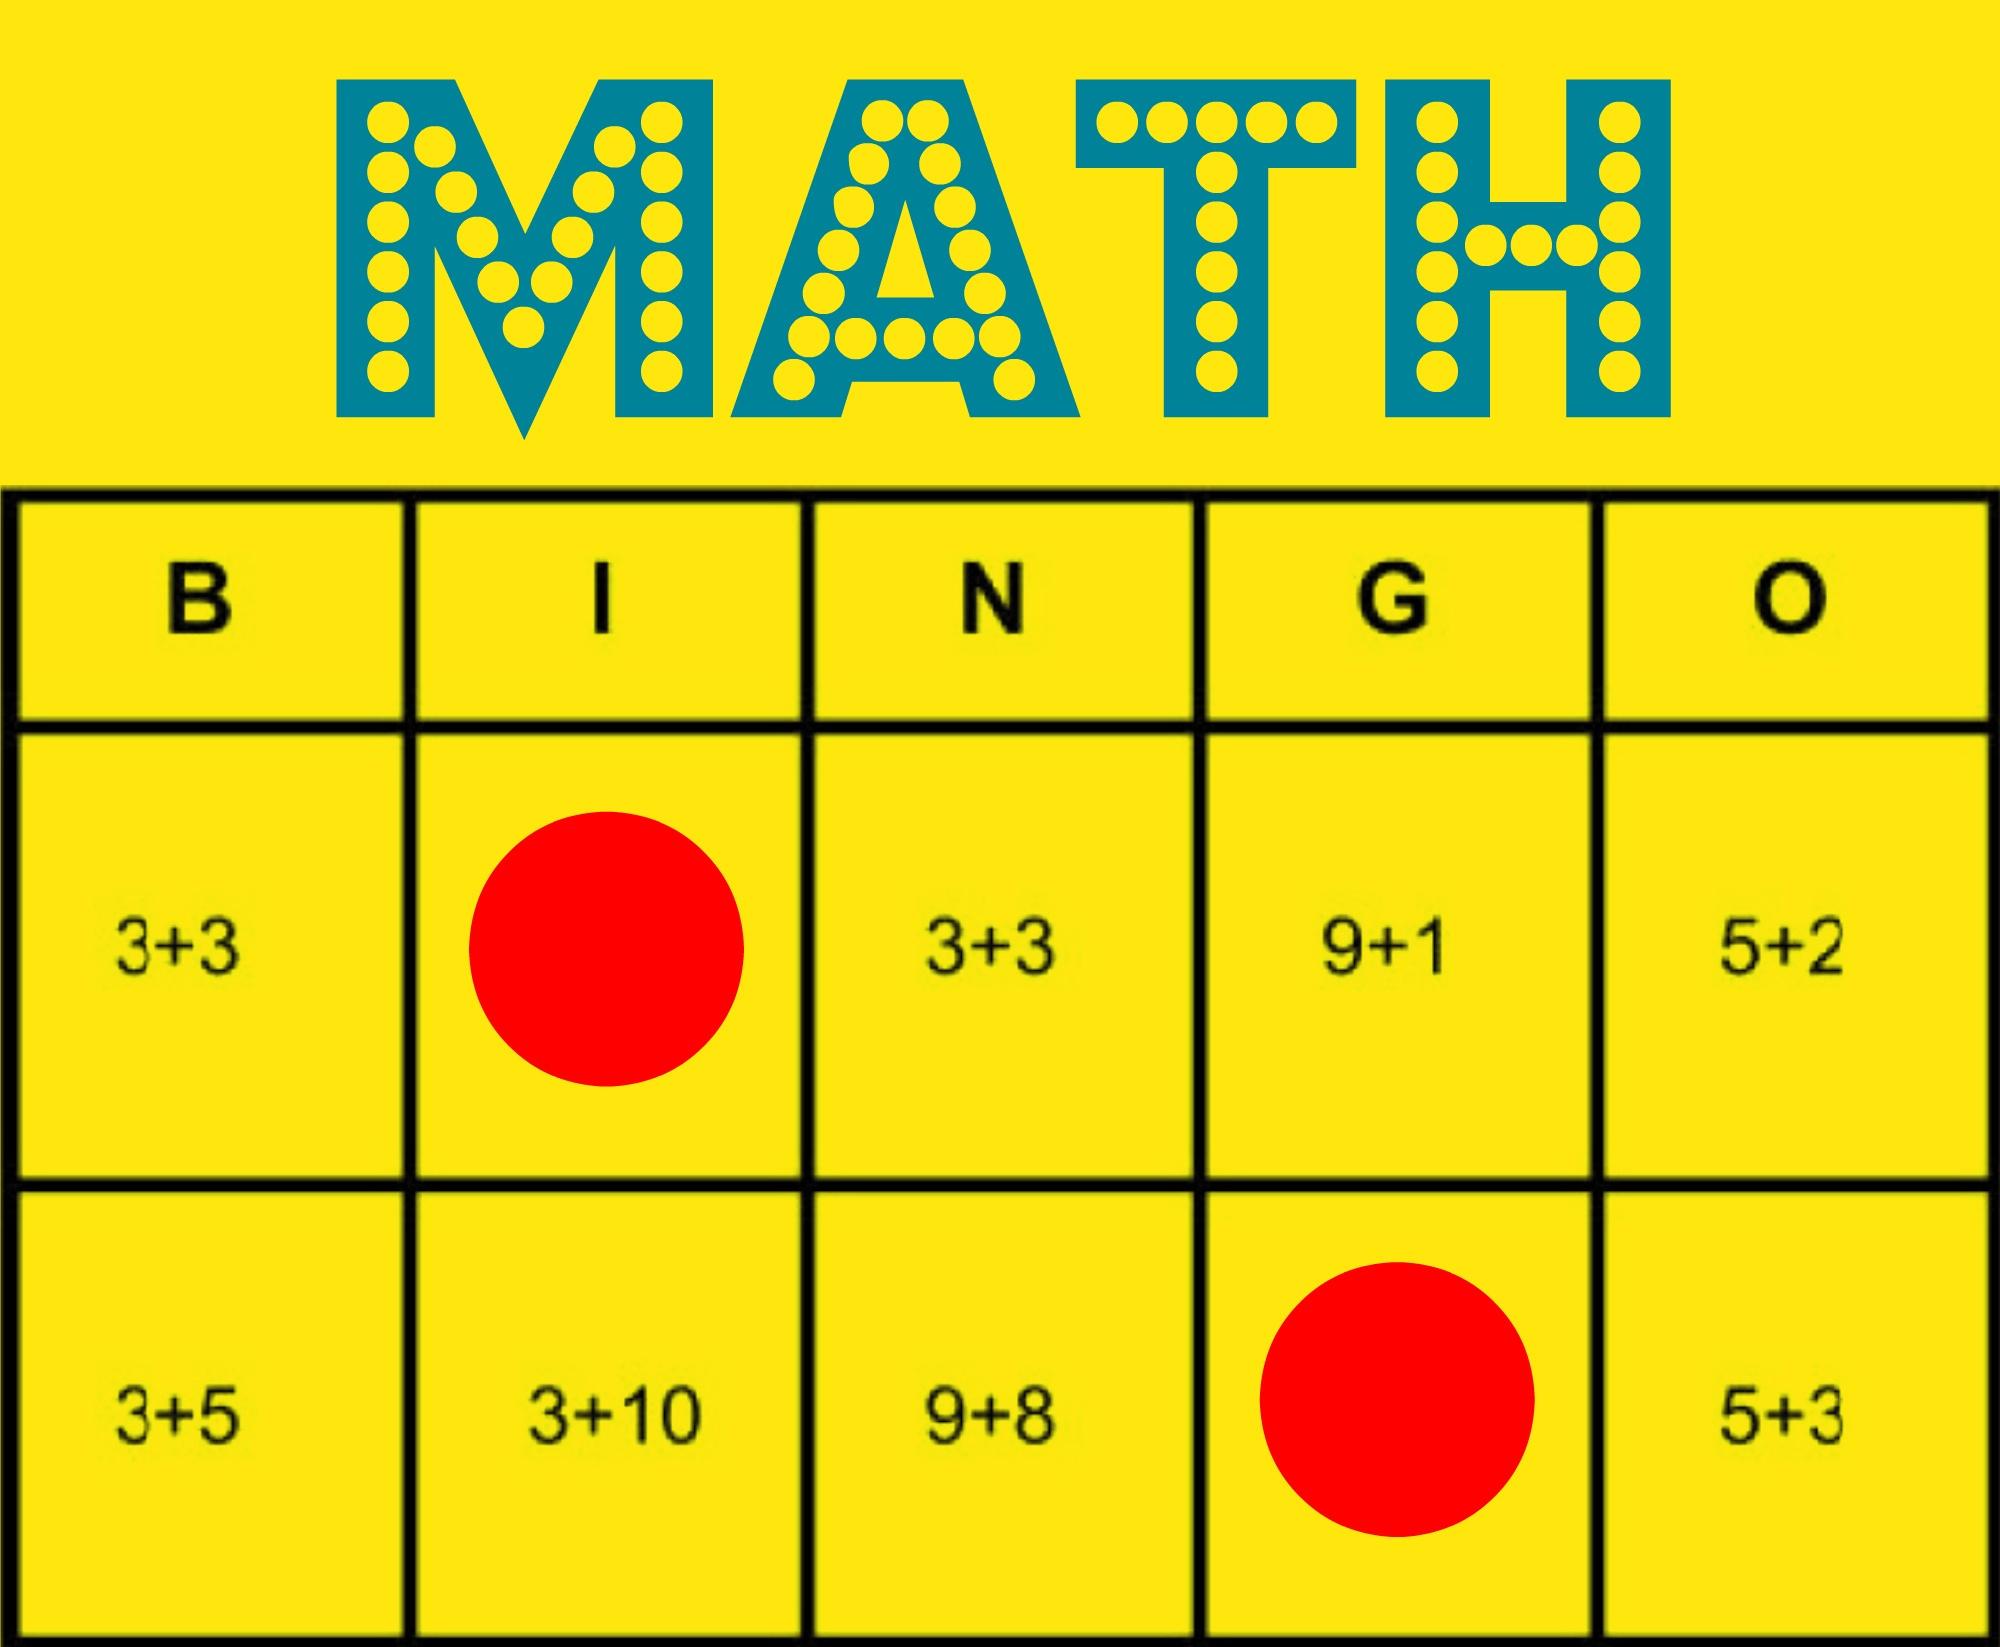 Math Bingo: Free Printable Game To Help All Students Learn Math - Math Bingo Free Printable